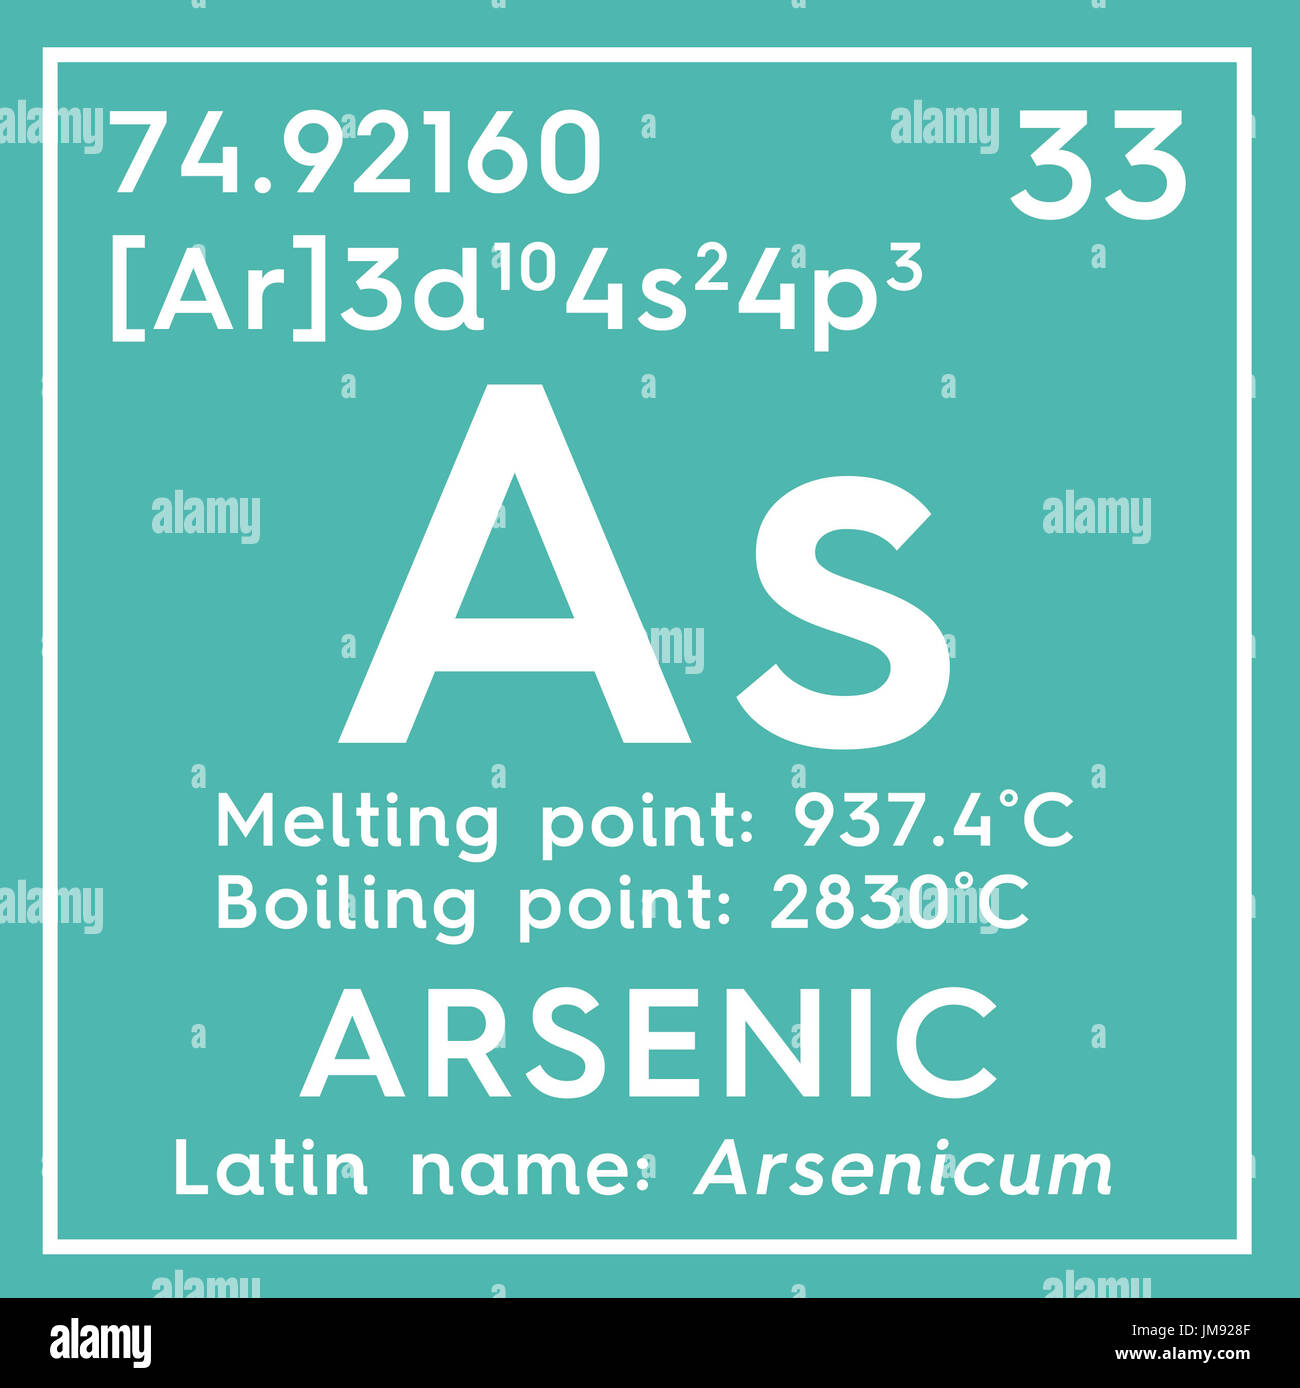 El arsnico arsenicum los metaloides elemento qumico de la el arsnico arsenicum los metaloides elemento qumico de la tabla peridica de mendeleyev arsnico en square cube concepto creativo urtaz Image collections